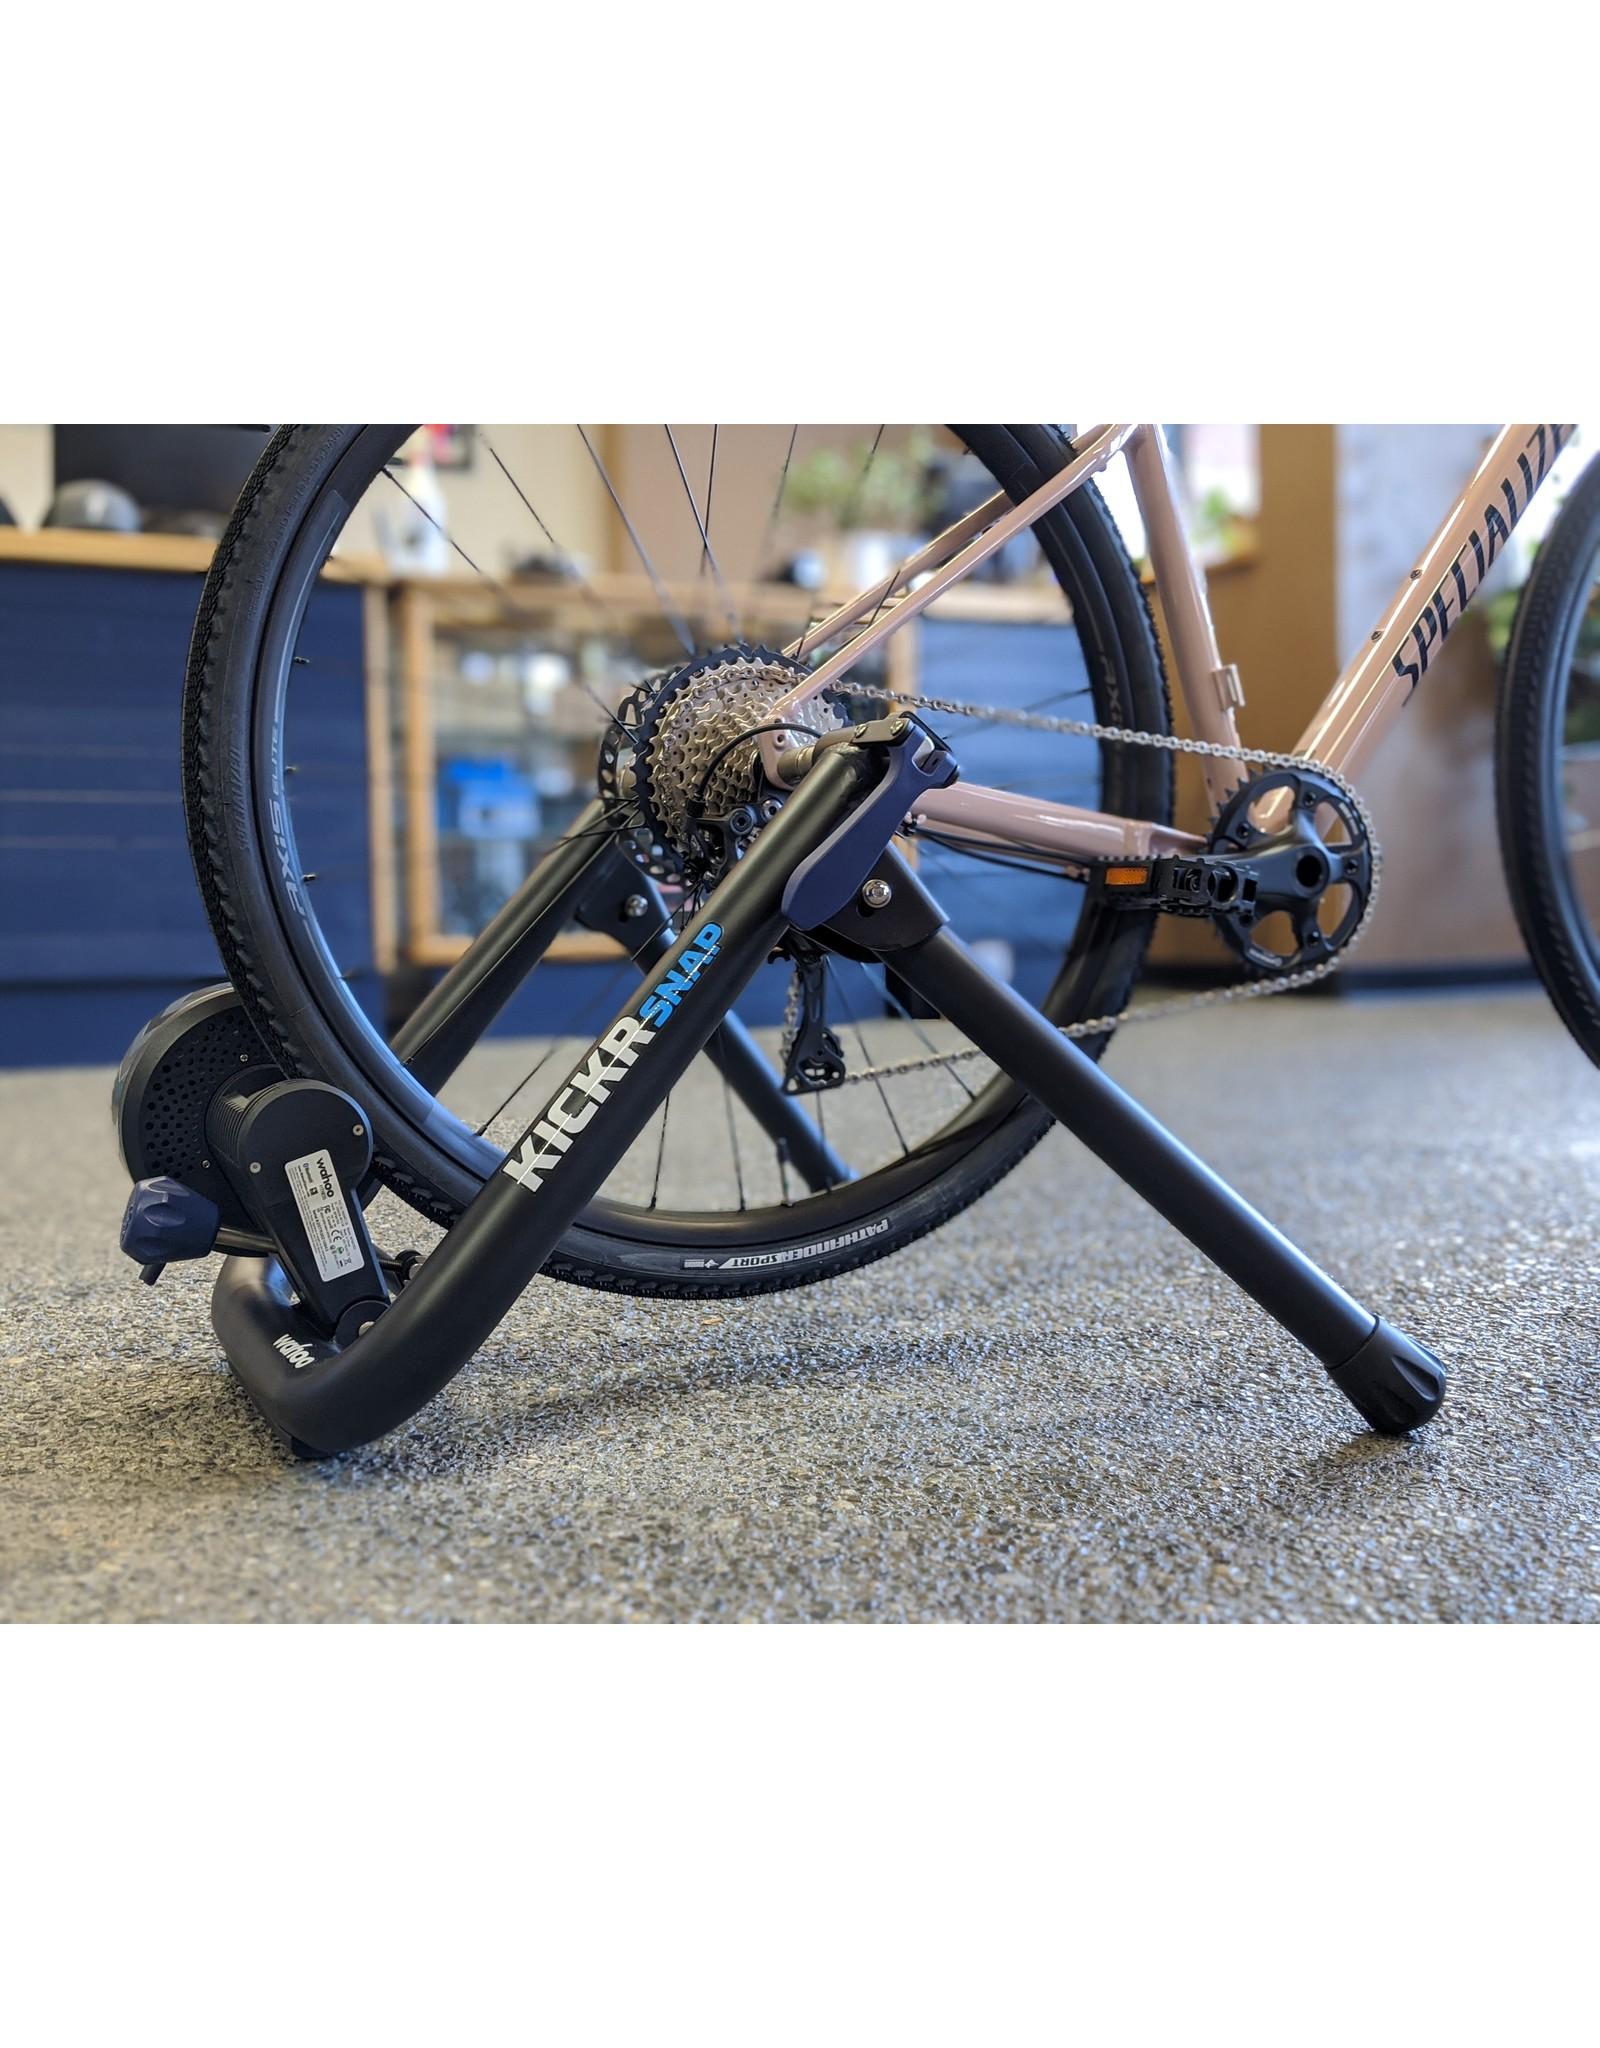 Wahoo Kickr Snap Bike Trainer